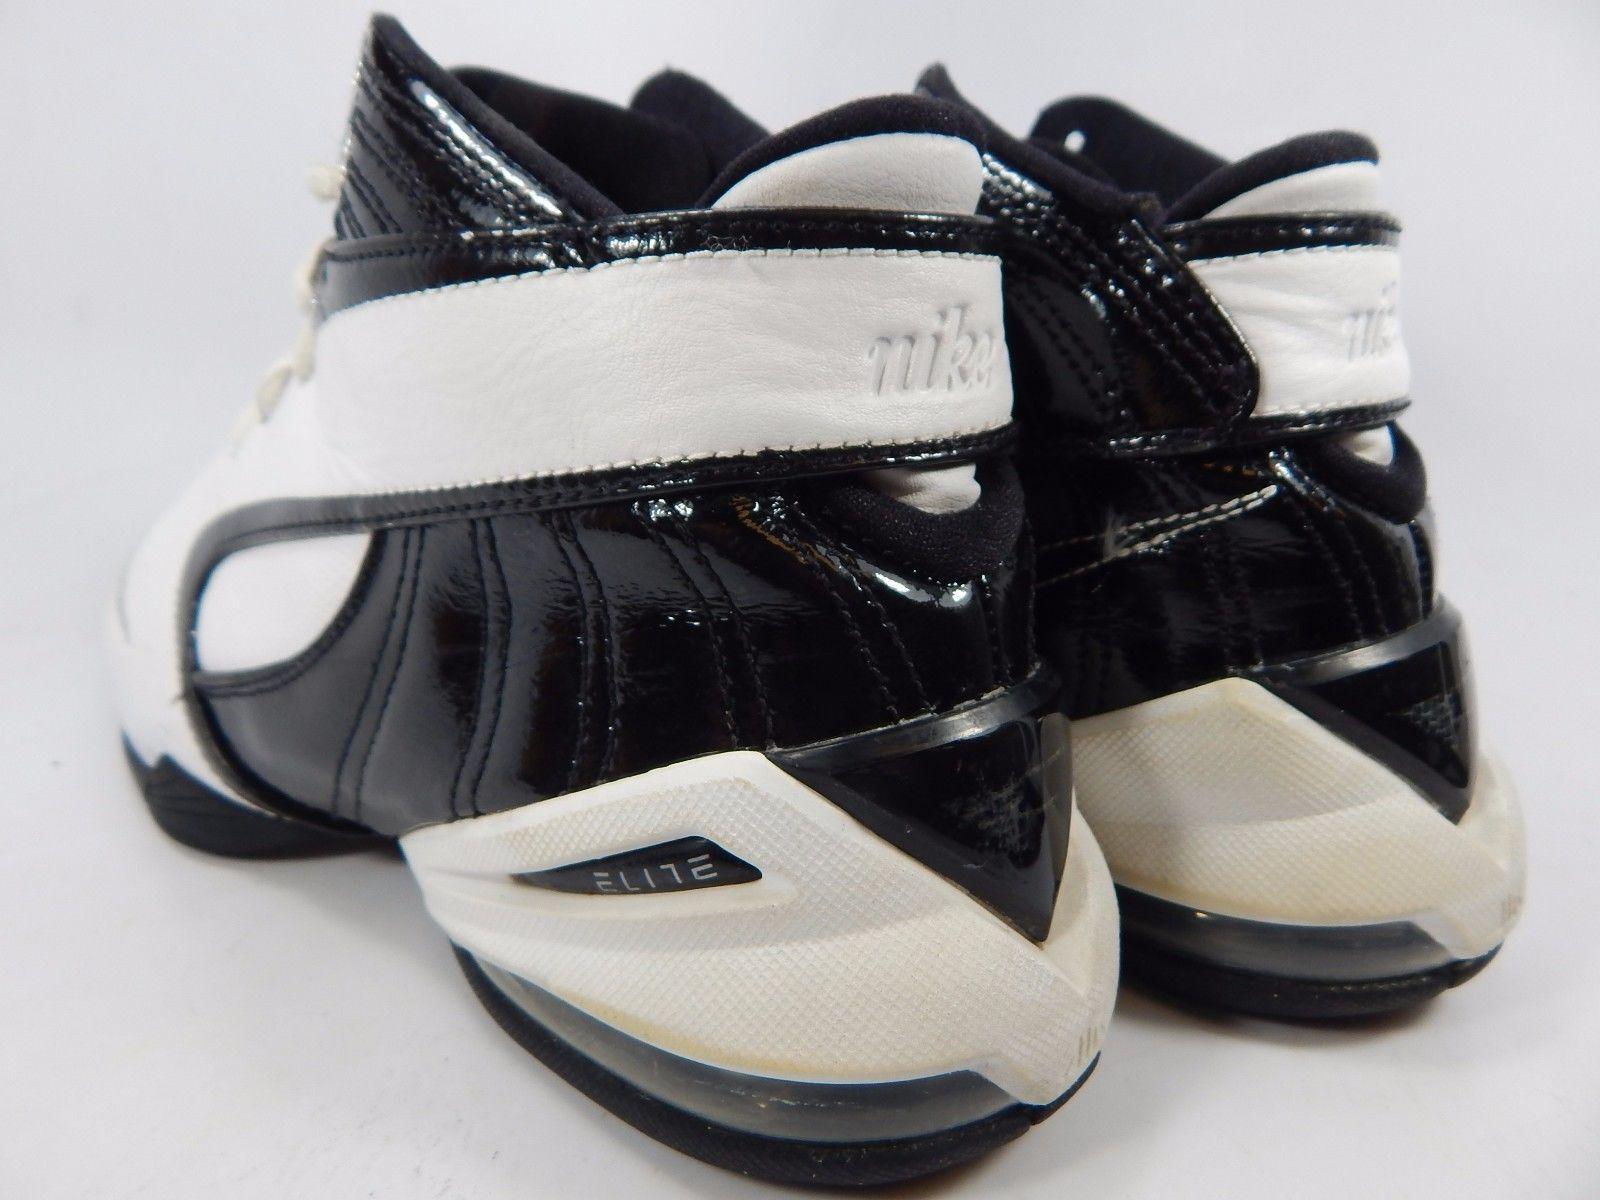 Nike Viz Air Elite 2007 Women's Basketball Shoes Sz US 8 M (B) EU 39 316687-101